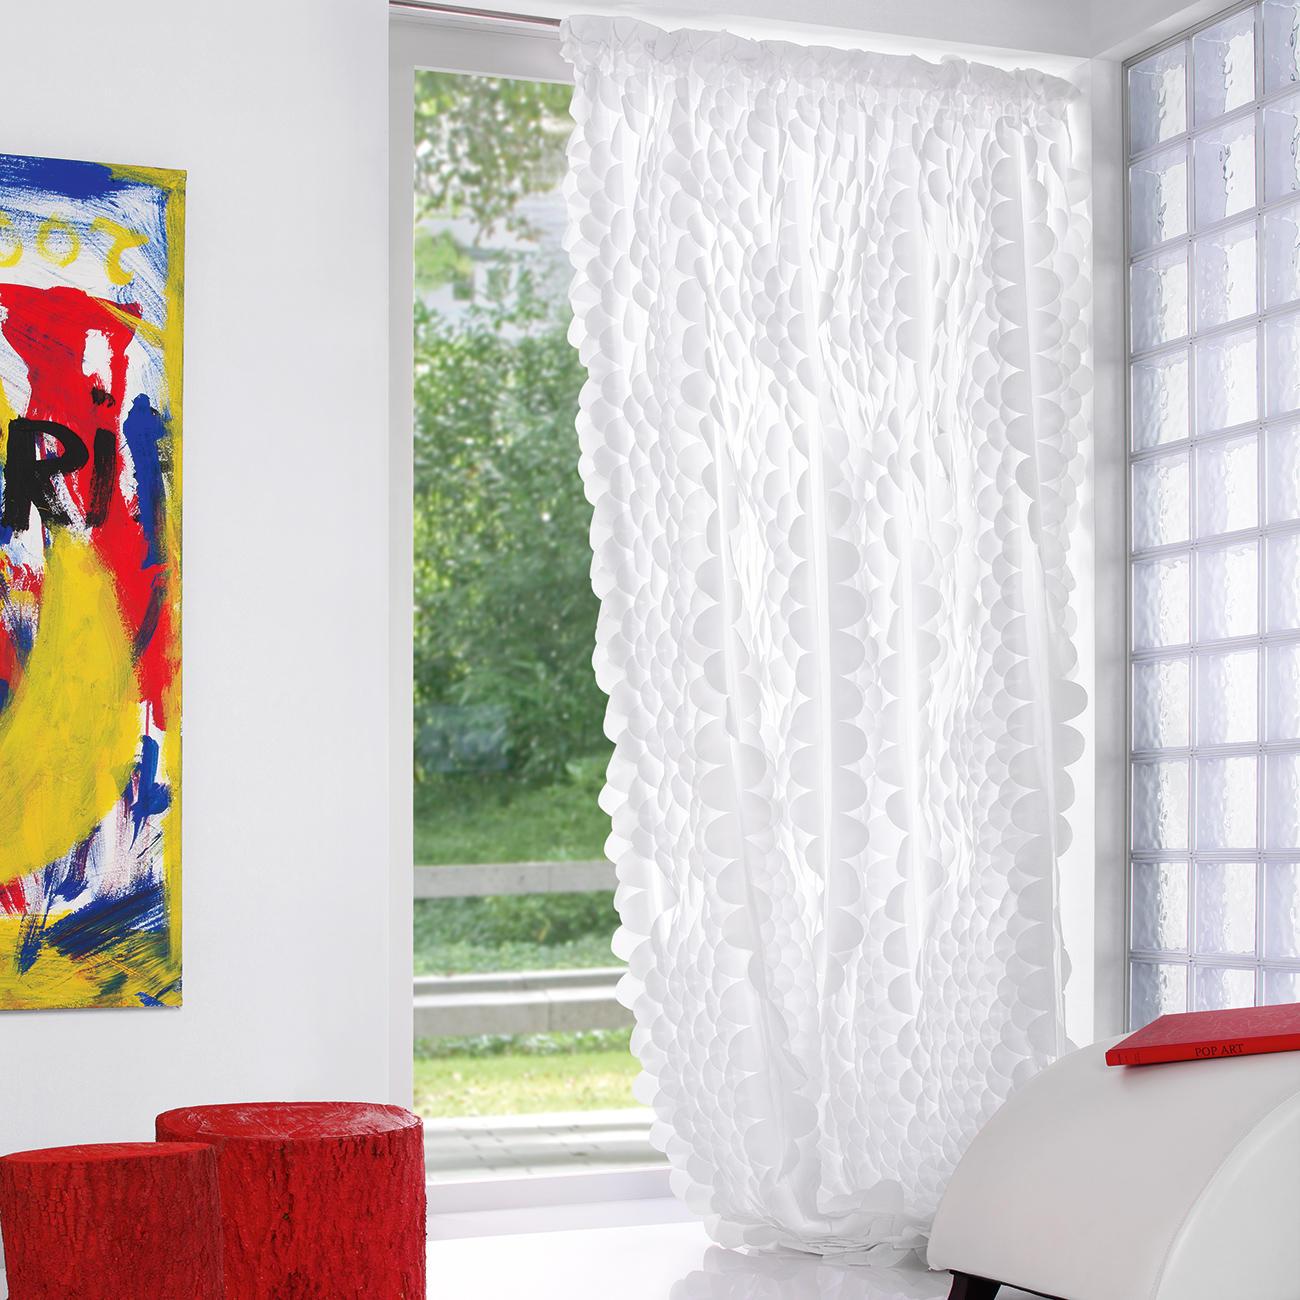 vorhang rixa 1 st ck vorh nge kaufen das kavaliershaus. Black Bedroom Furniture Sets. Home Design Ideas